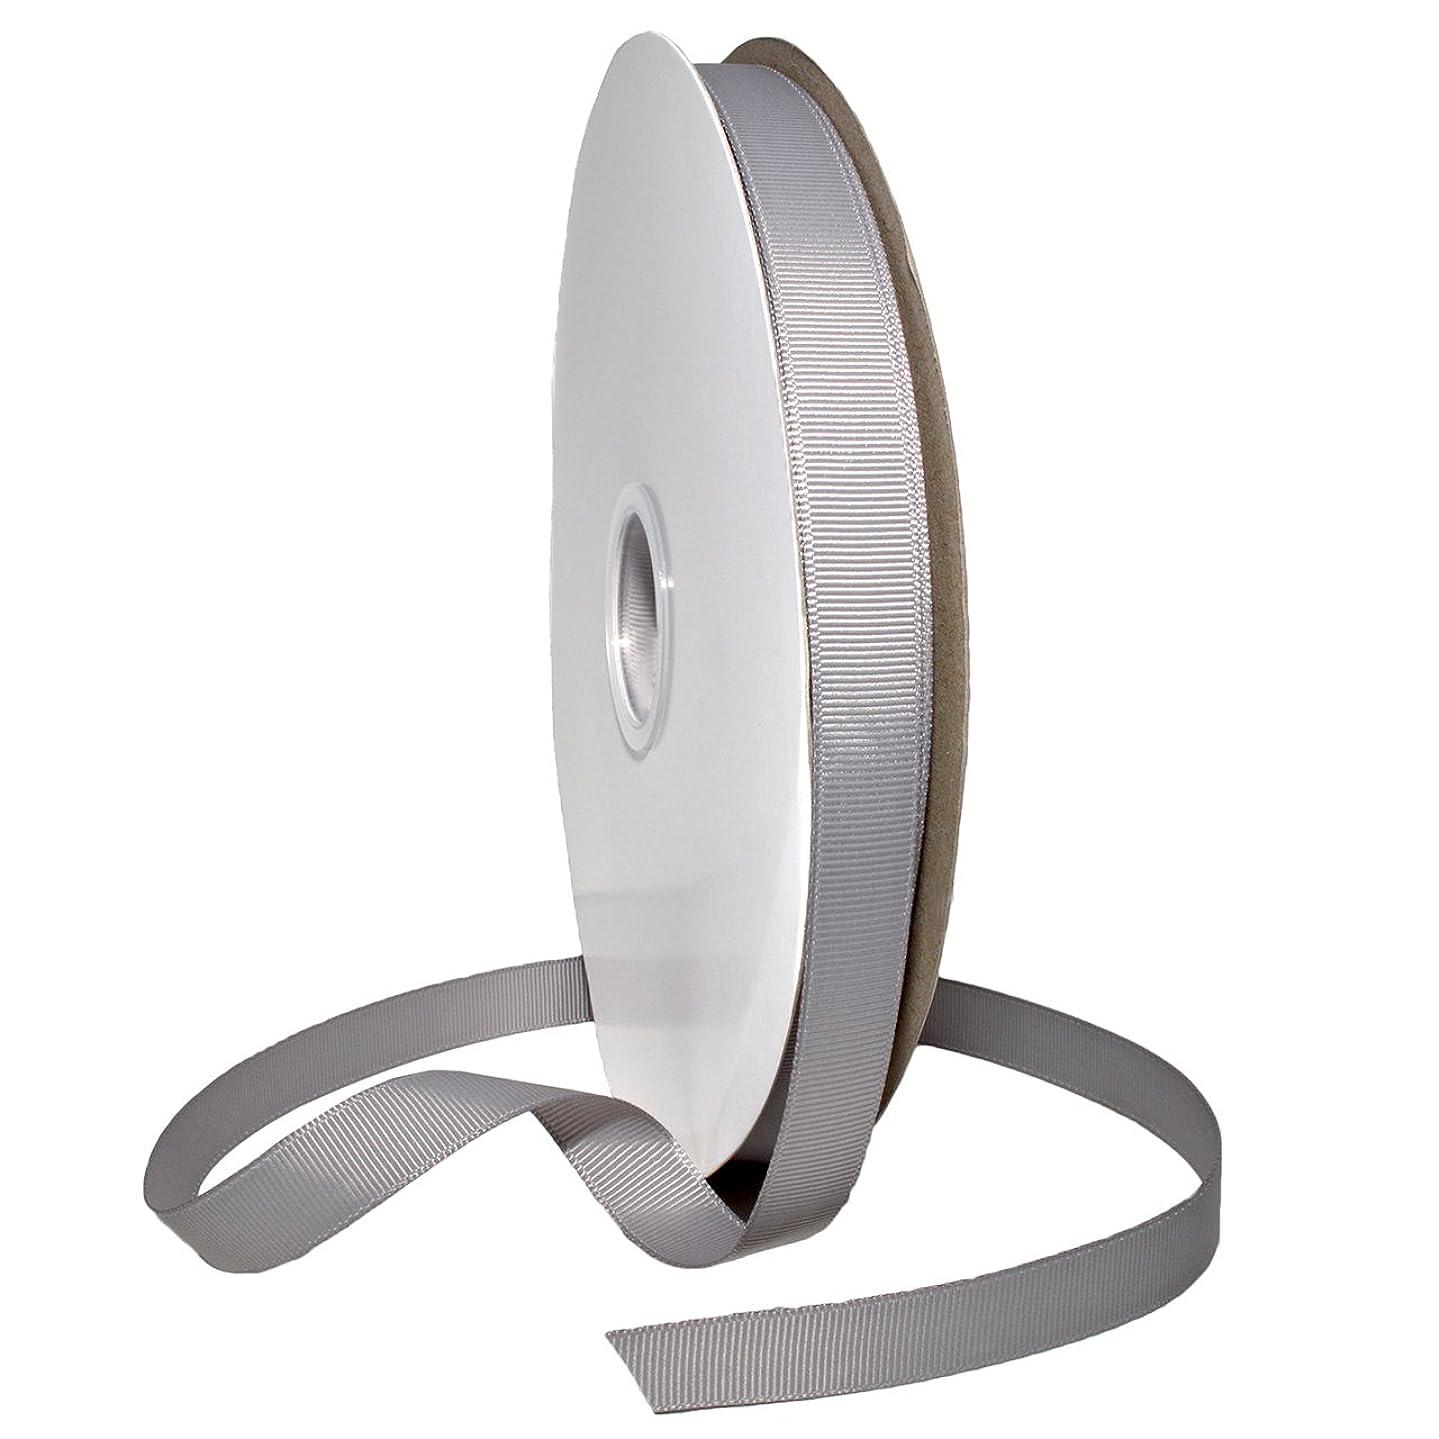 Morex Ribbon 06616/00-012 Grosgrain Fabric Ribbon, 5/8